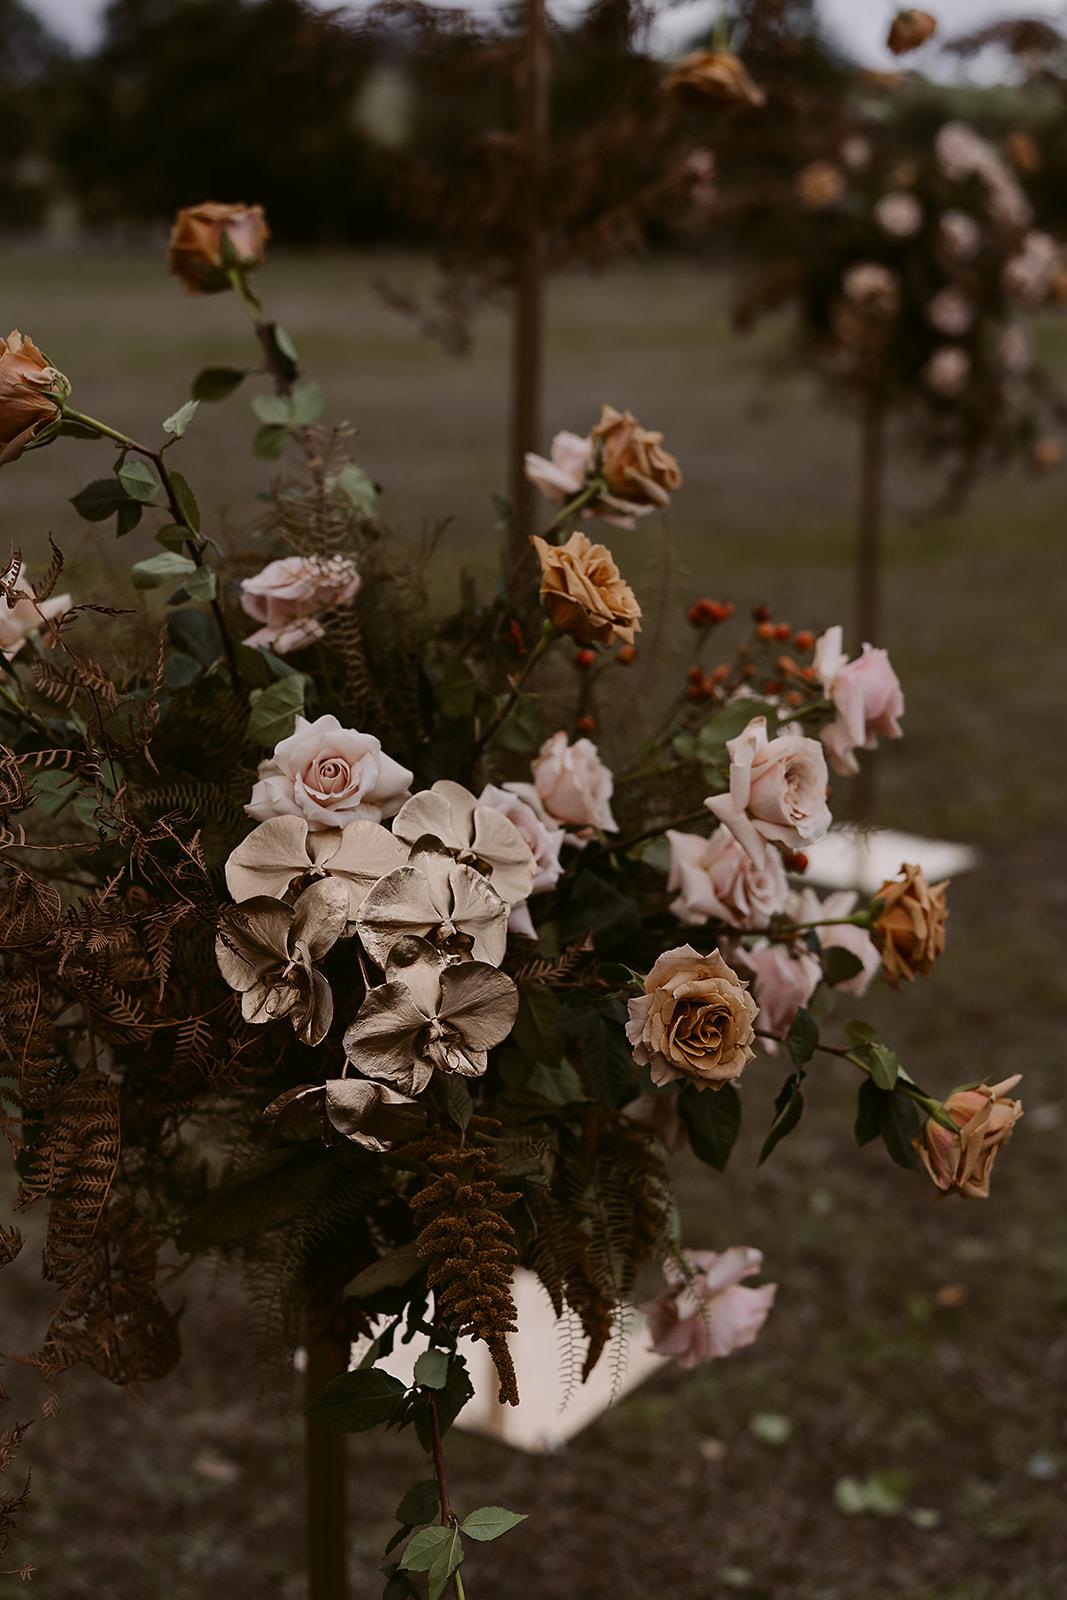 Immerse_Yarra_Valley_Same_Sex_Wedding_-_Ashleigh_Haase_Photography-144.jpg